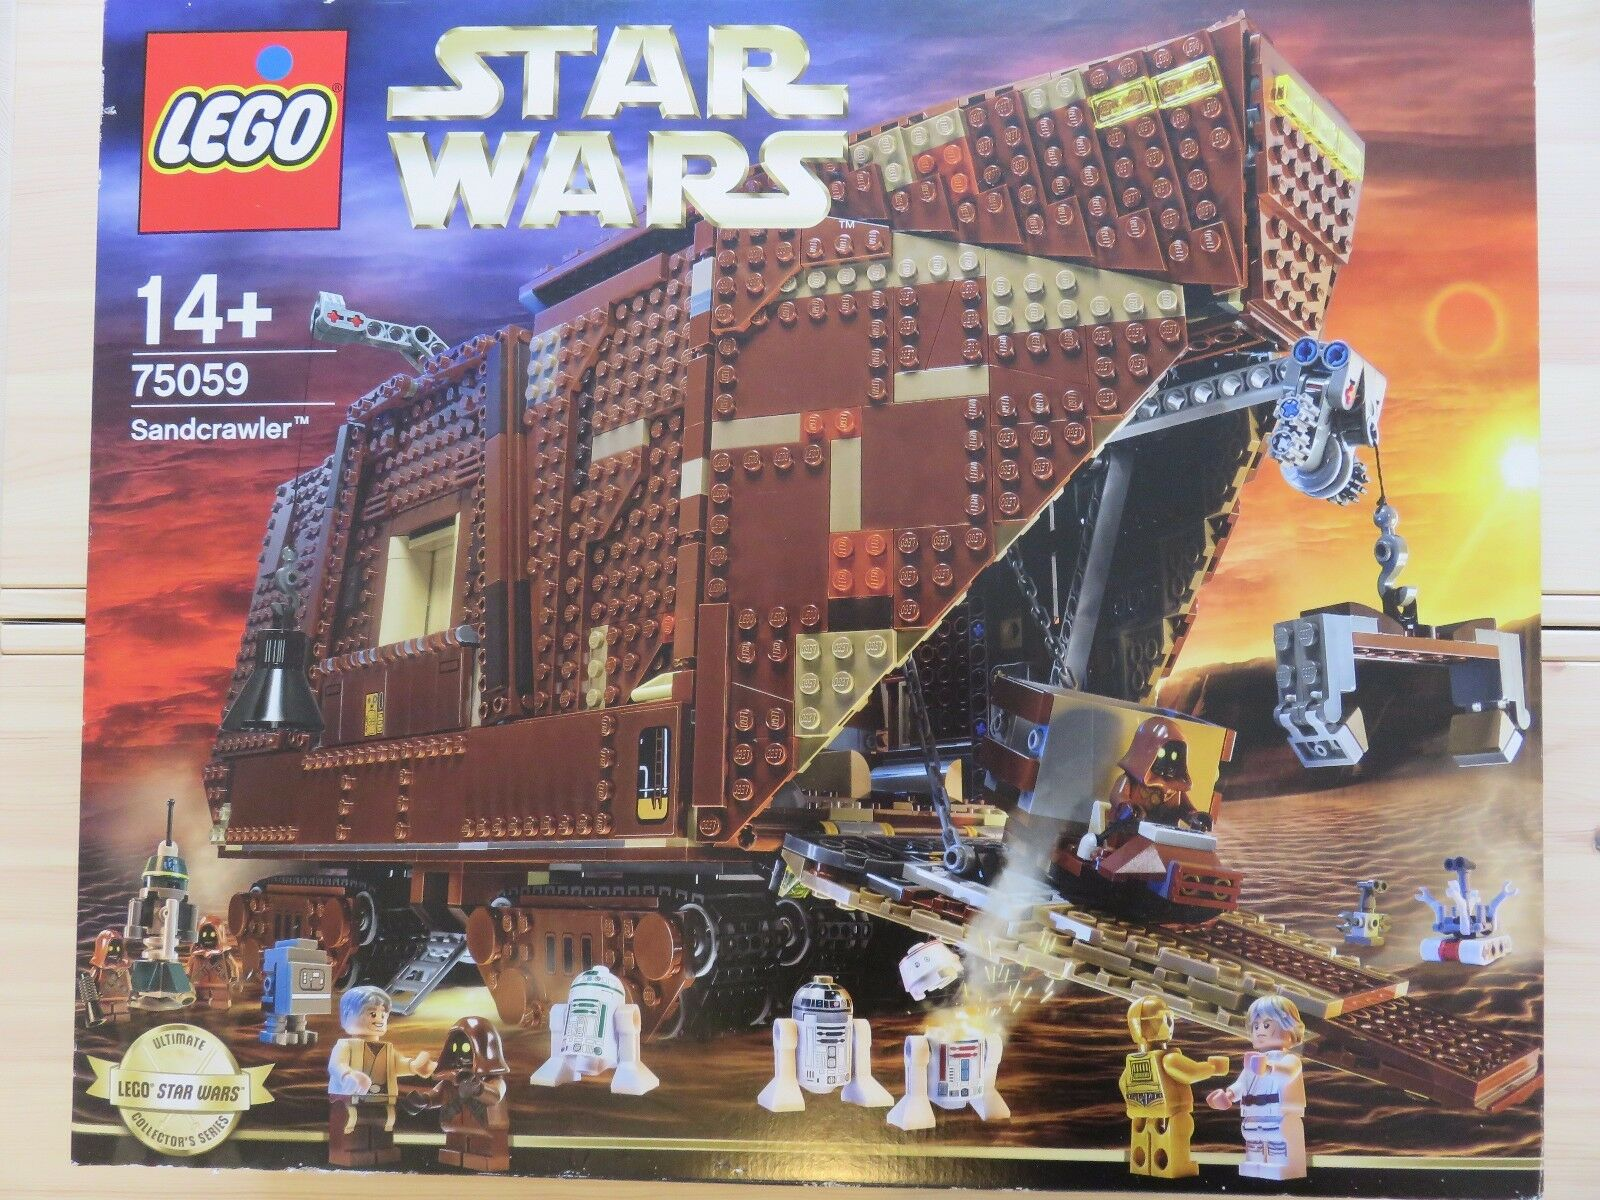 ordinare on-line Lego Estrella Estrella Estrella Guerras 75059 secrawler  esclusivo